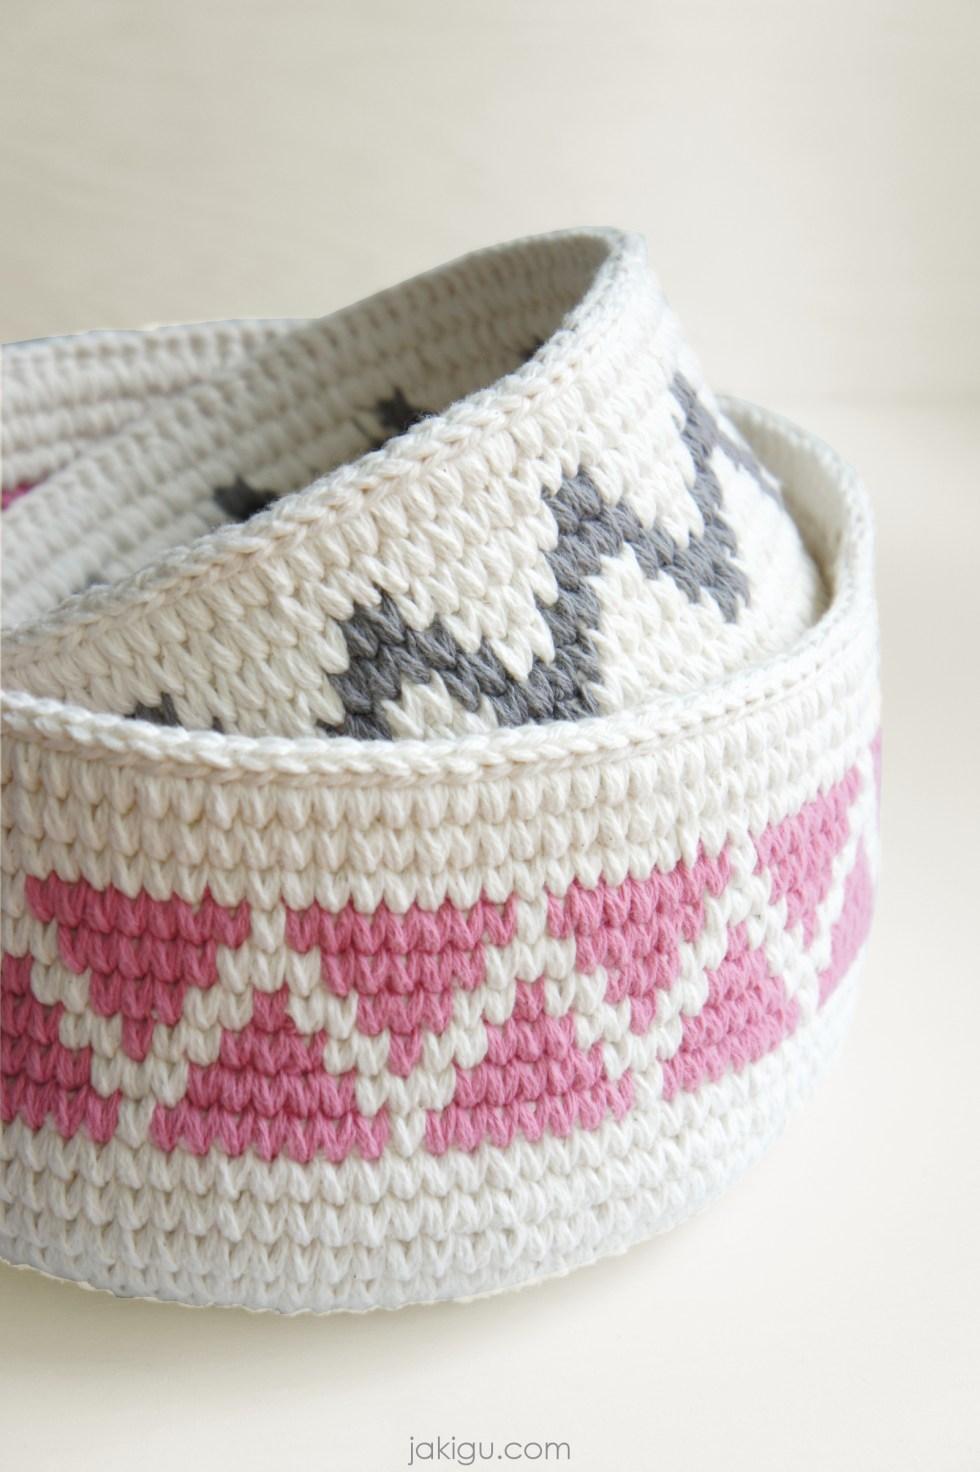 Geometric crochet baskets by jakigu.com